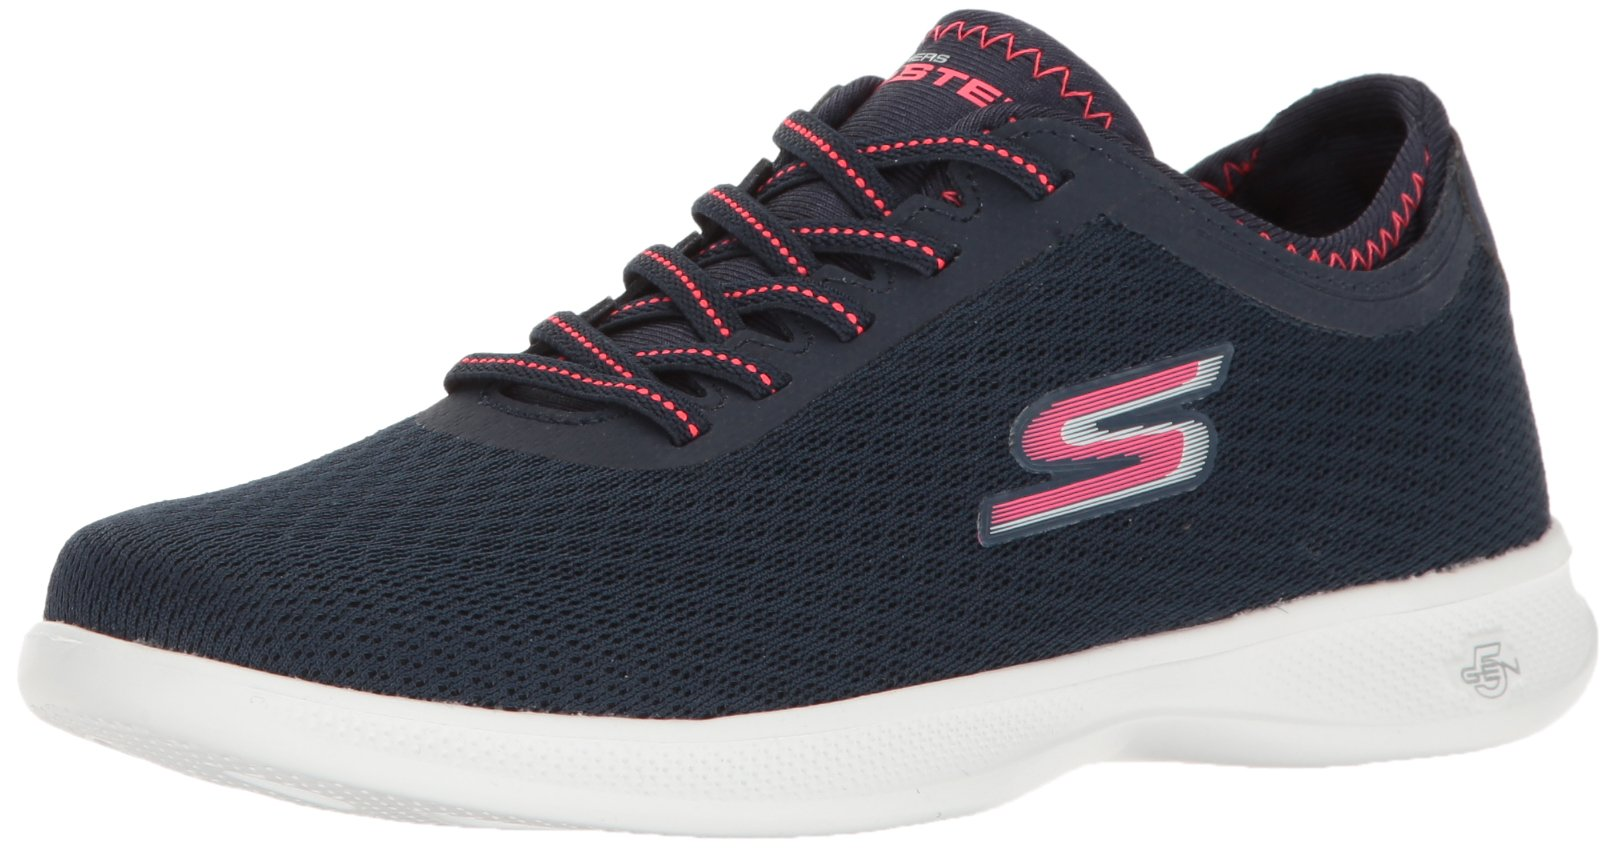 Skechers Performance Women's Go Step Lite Walking Shoe,Navy/Pink Mesh,7.5 M US